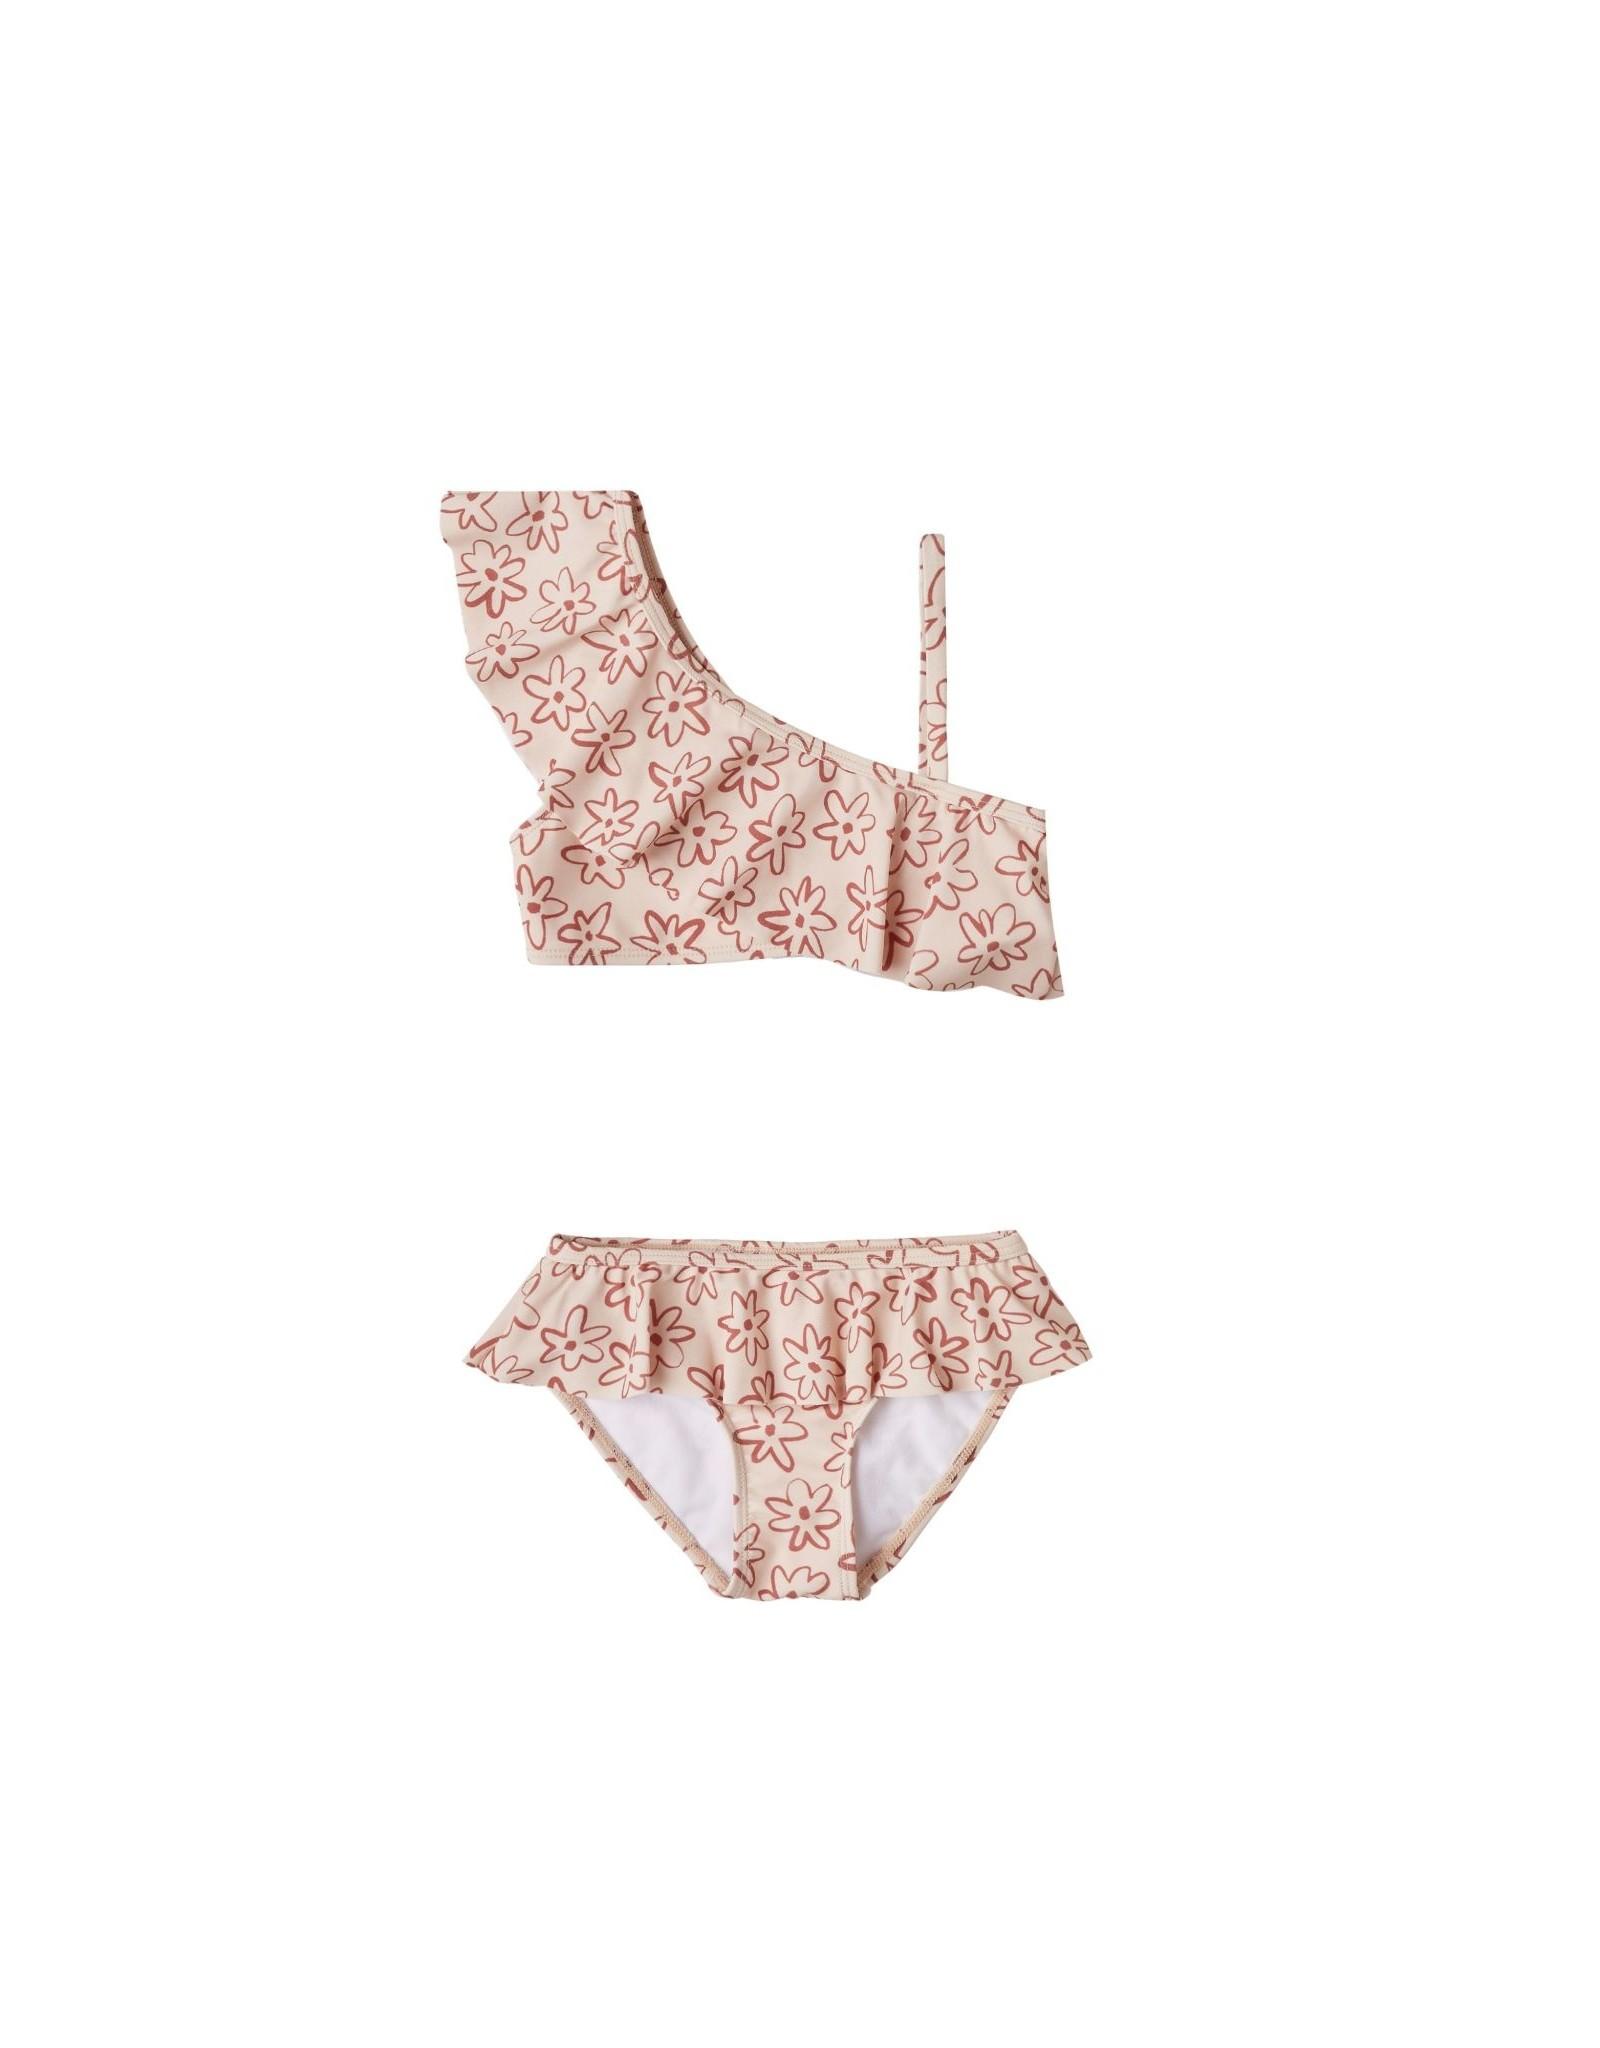 Rylee and Cru flower outline skirted bikini